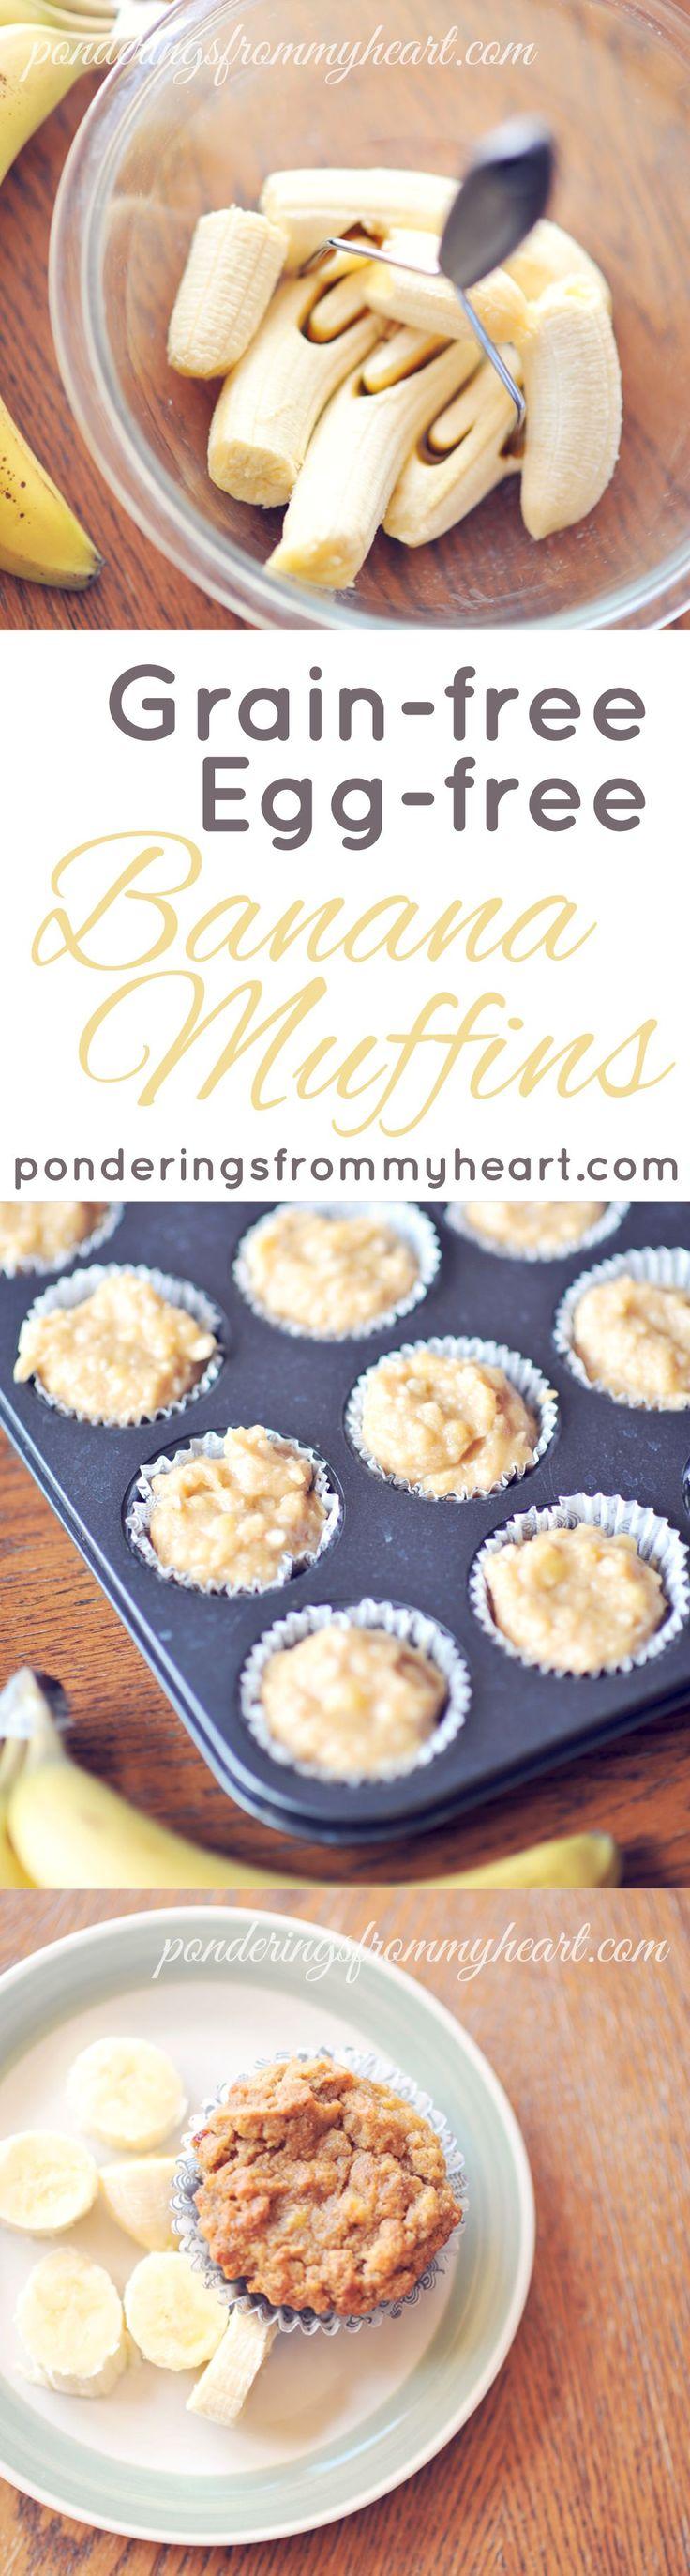 Banana Muffins | Grain-free and Egg-free | Ponderings From My Heart | Ponderings From My Heart